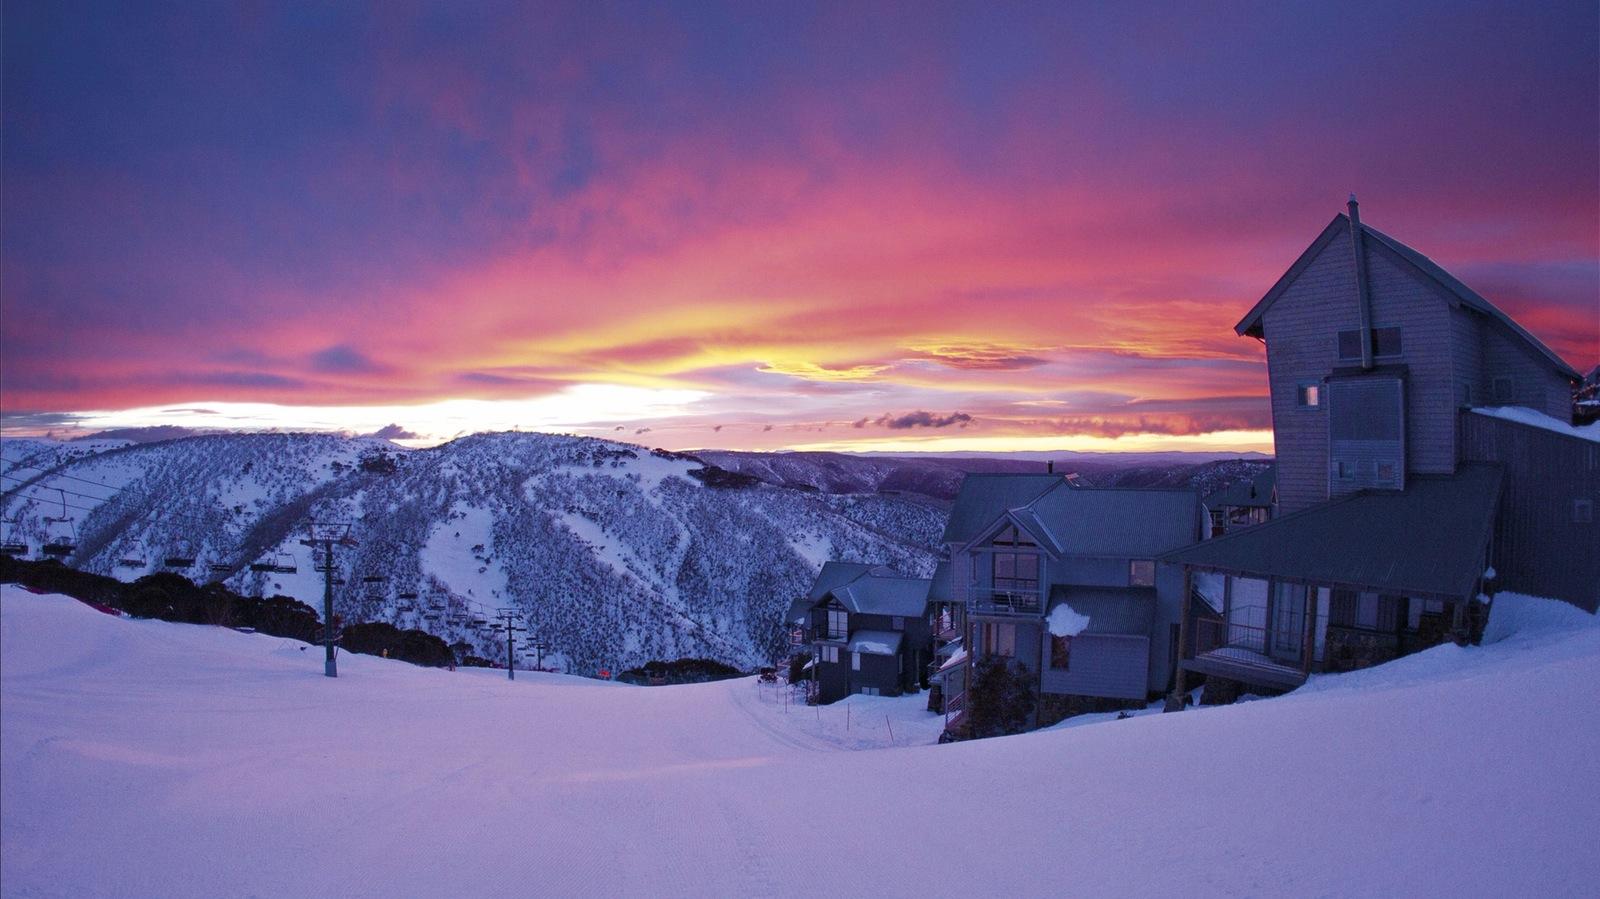 Mt Hotham, Luxury Snow Tour, Melbourne Australia